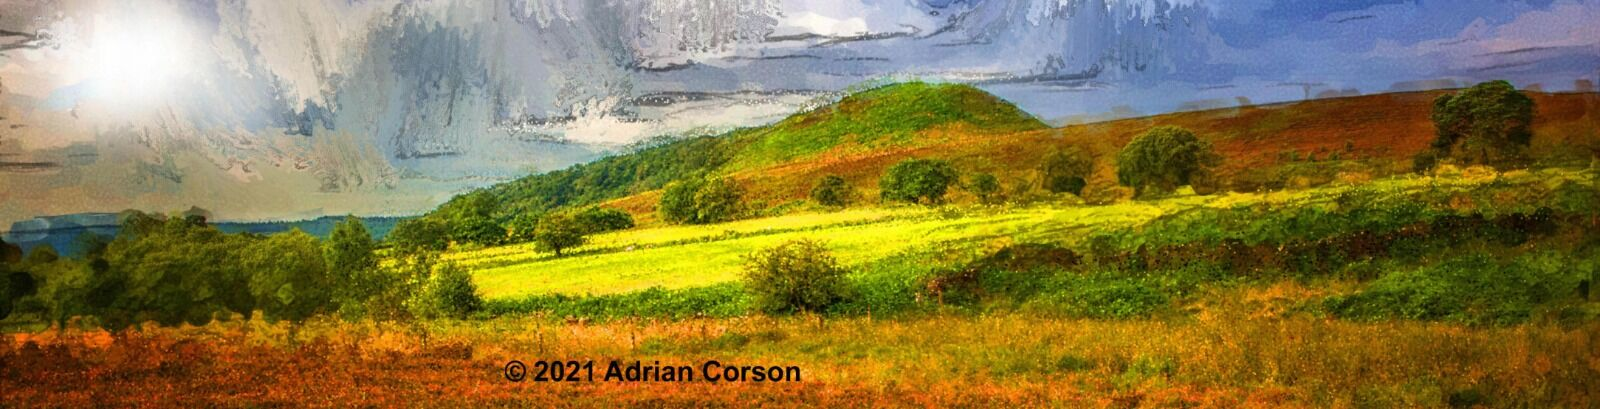 190-green hillside